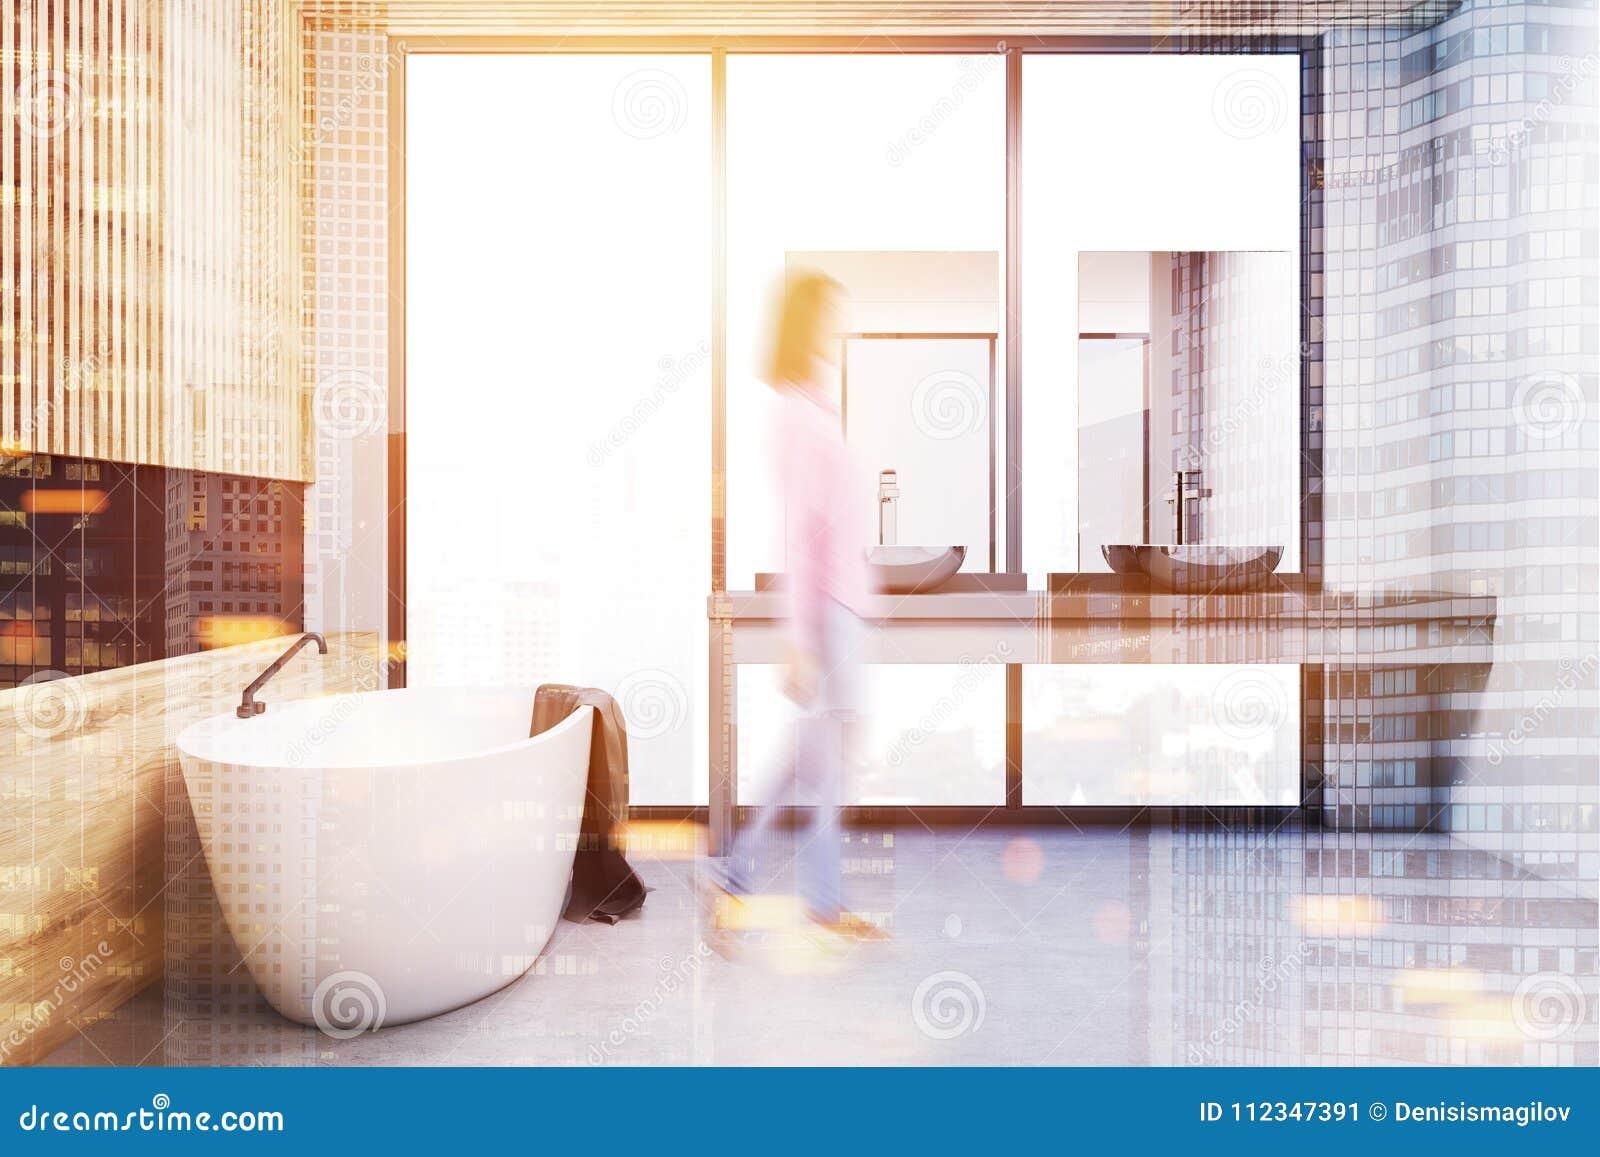 Wooden And Black Modern Bathroom, Side View Blur